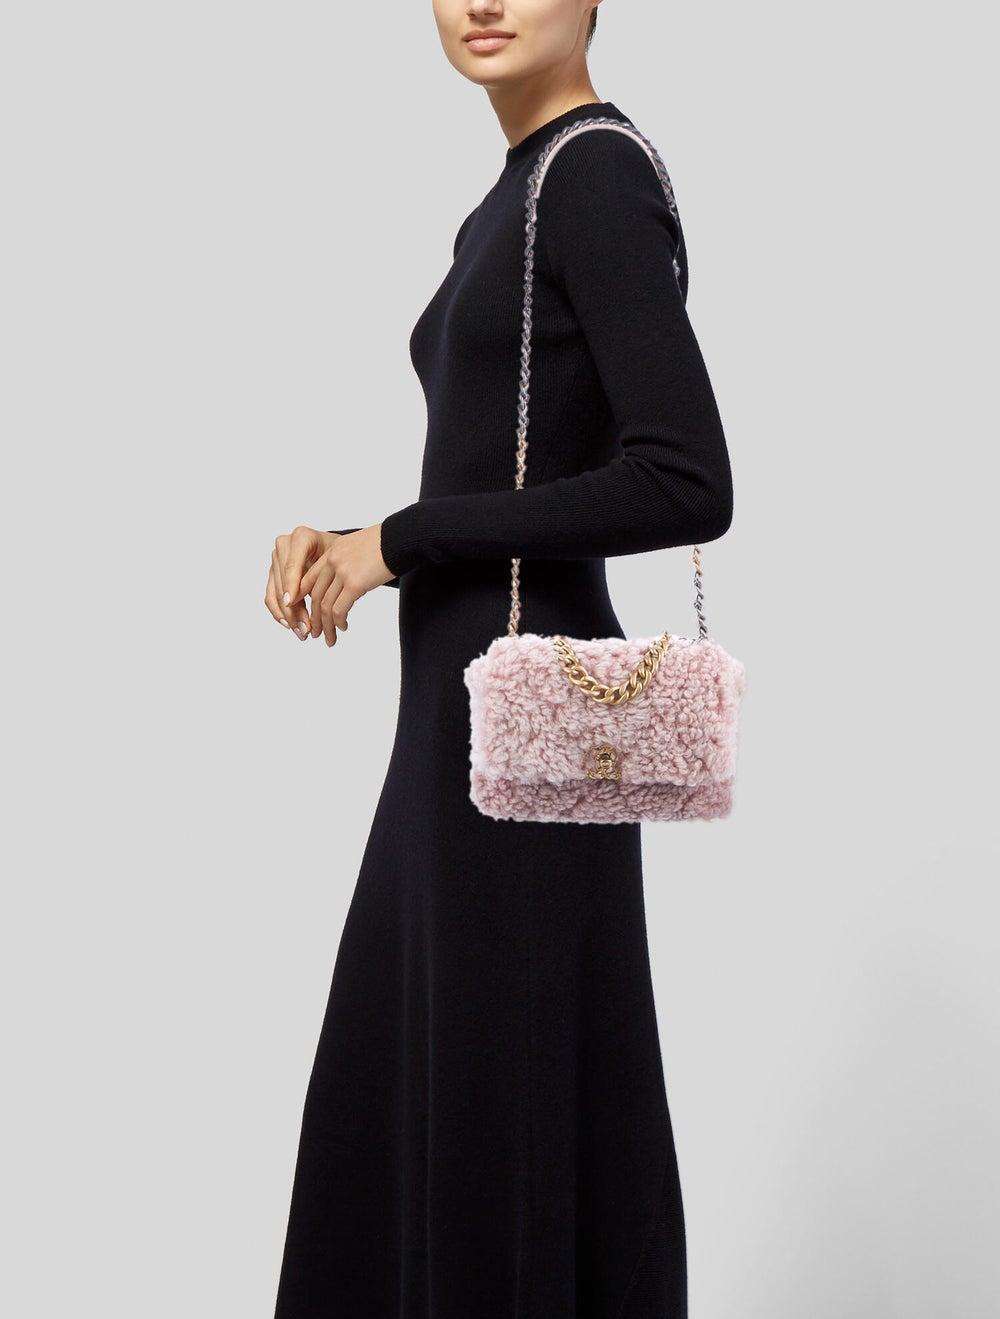 Chanel Shearling 19 Flap Bag Pink - image 2